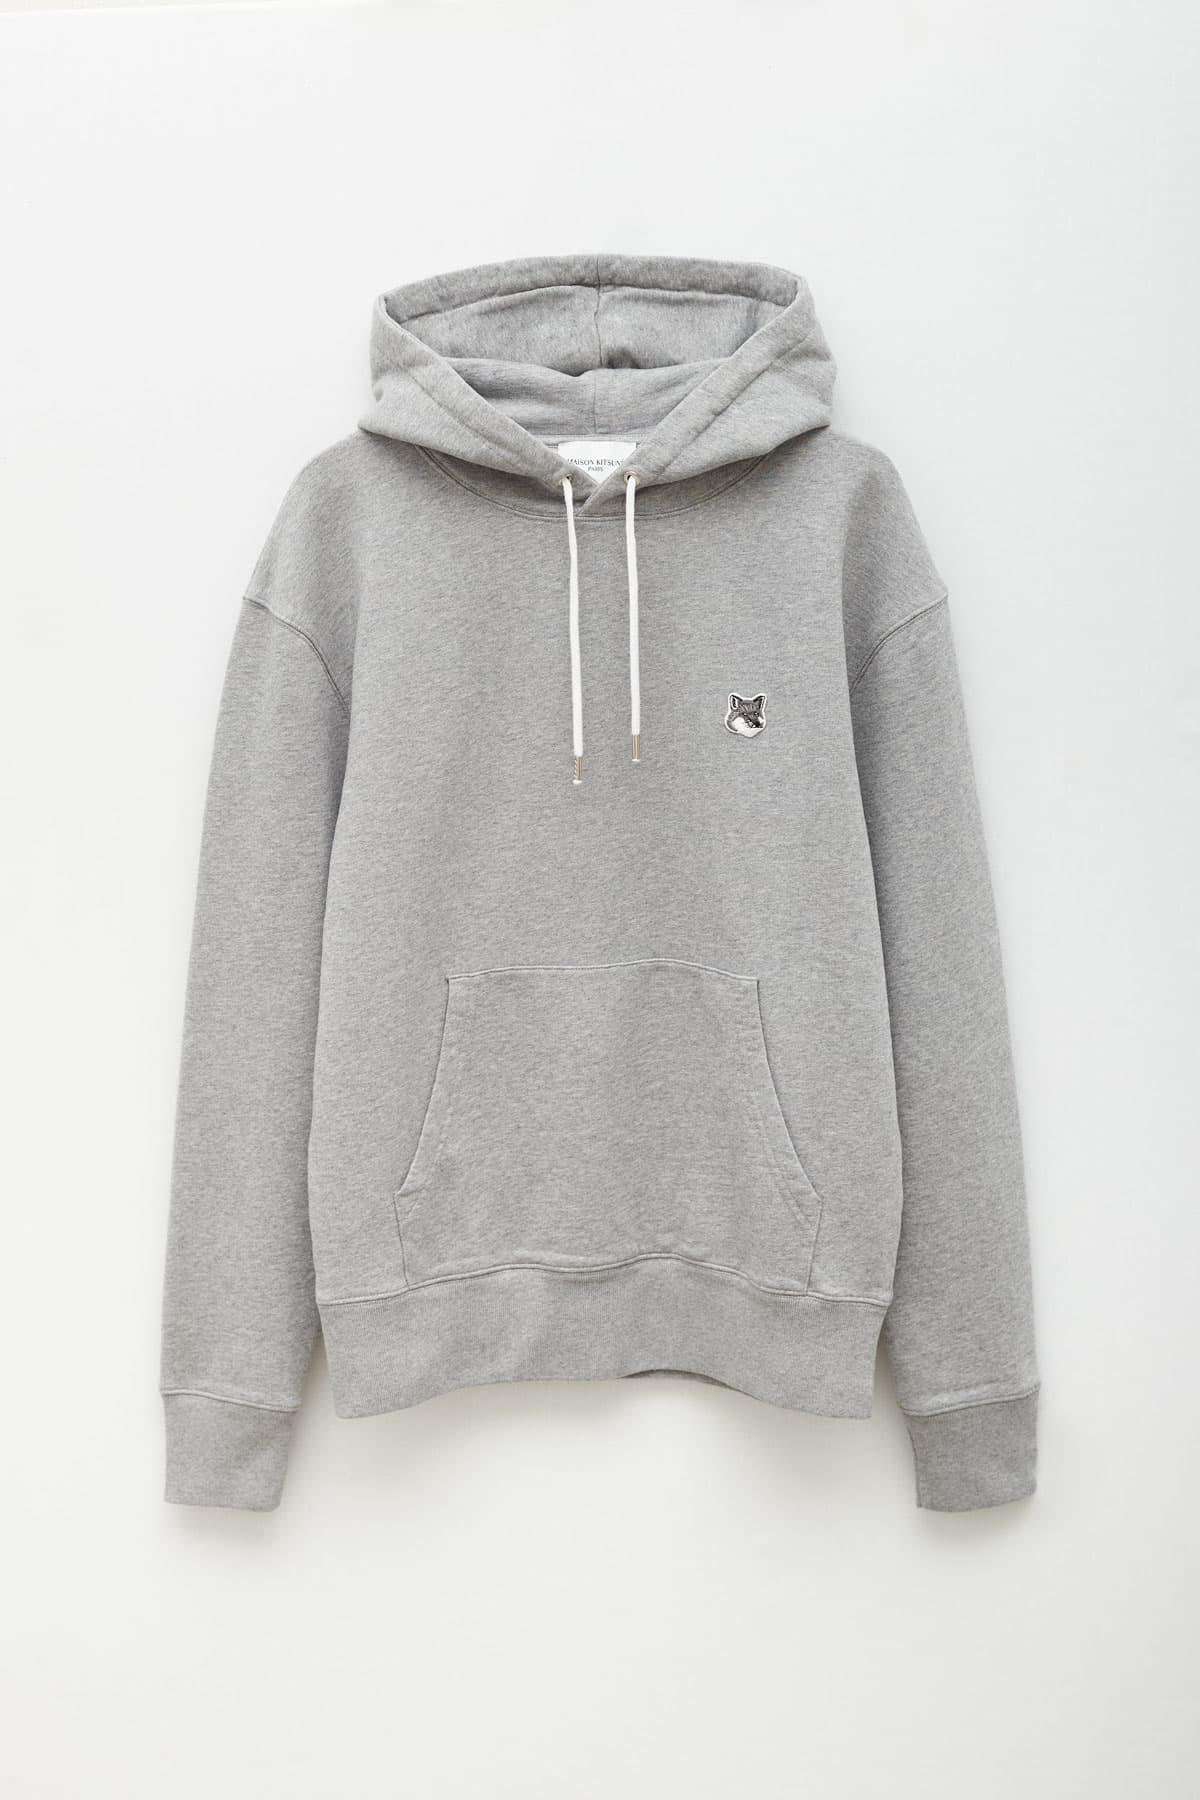 Shop Aries Blue Multi Oversized Fleece Sweat